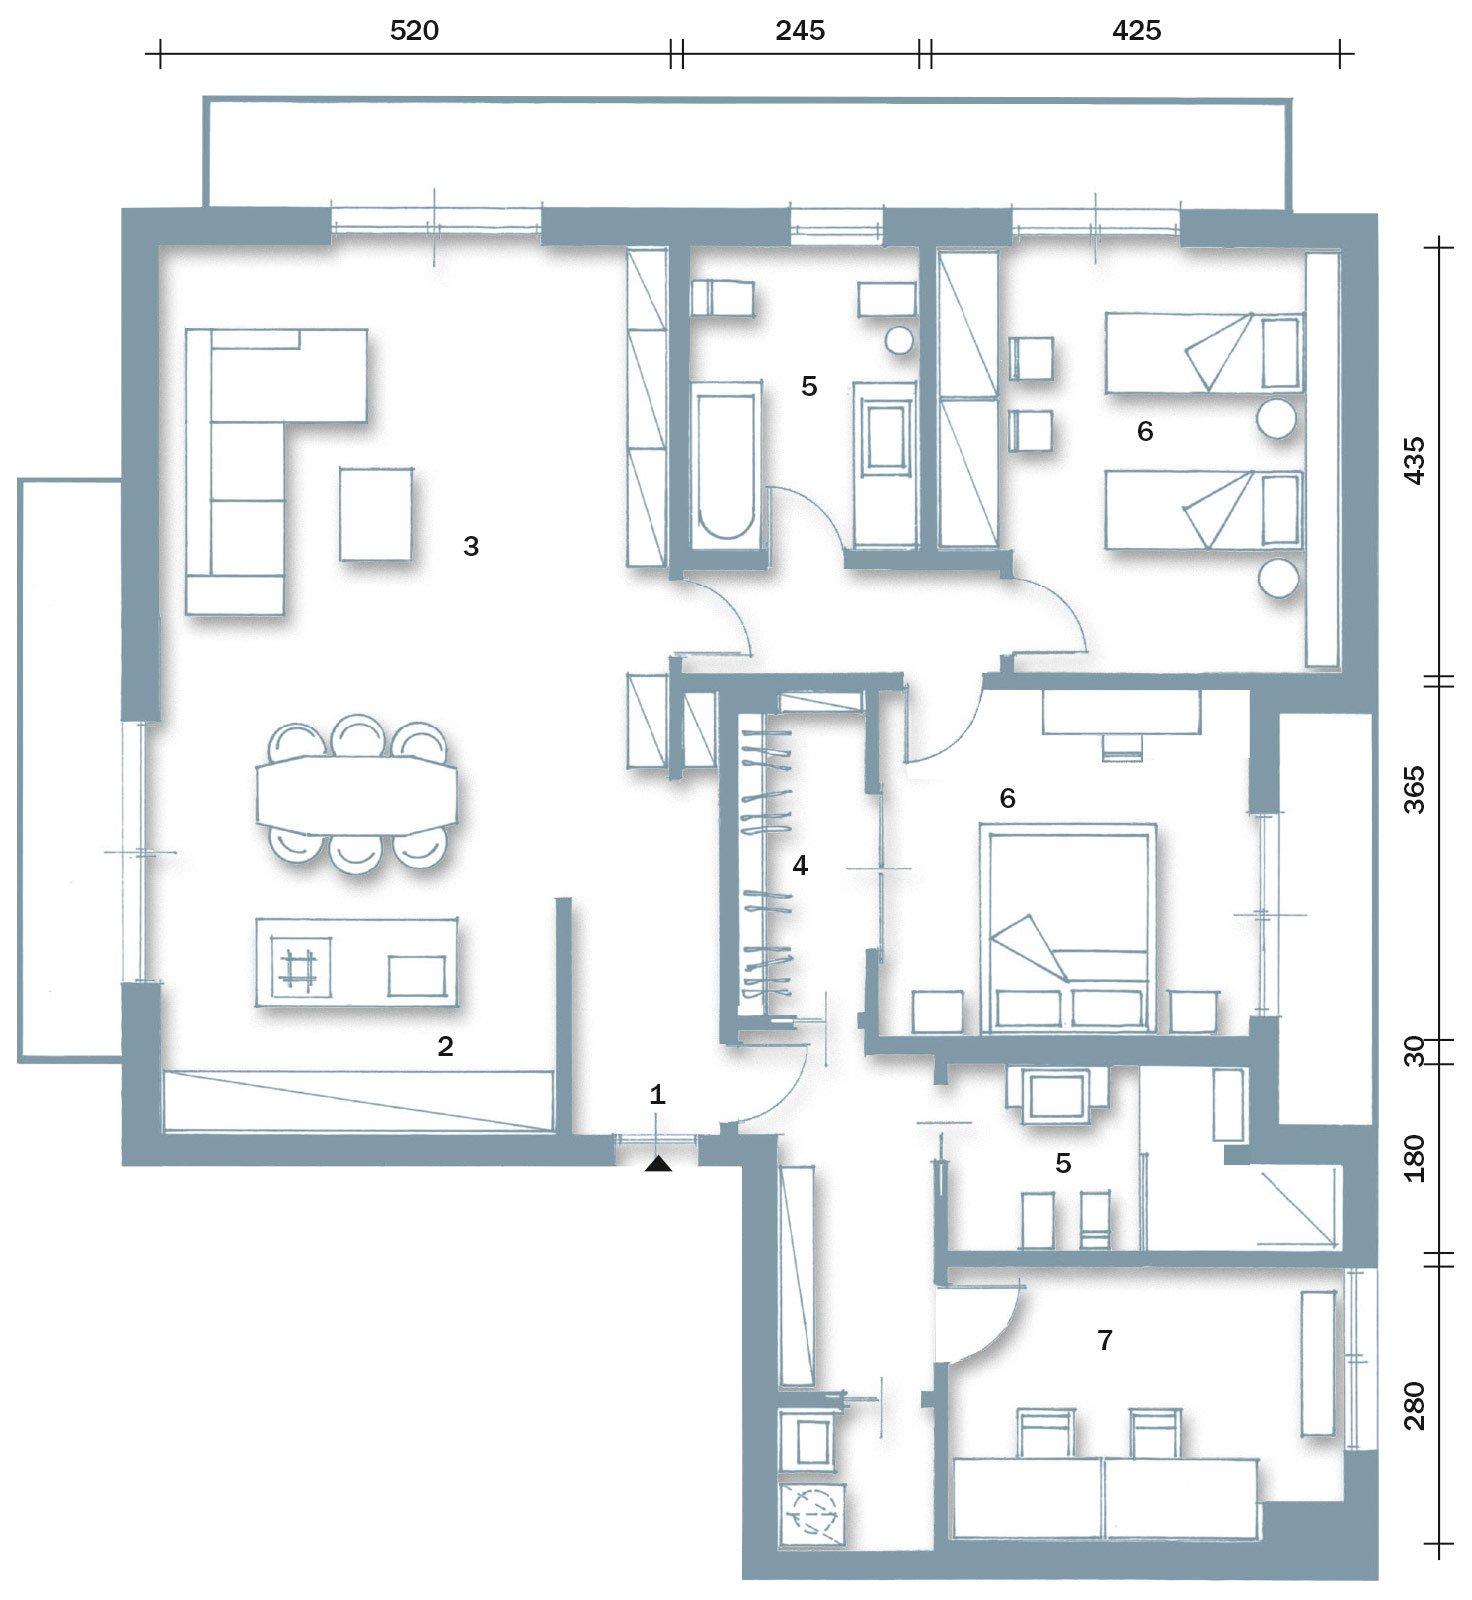 Pianta casa vazzola cose di casa - Disegno pianta casa ...